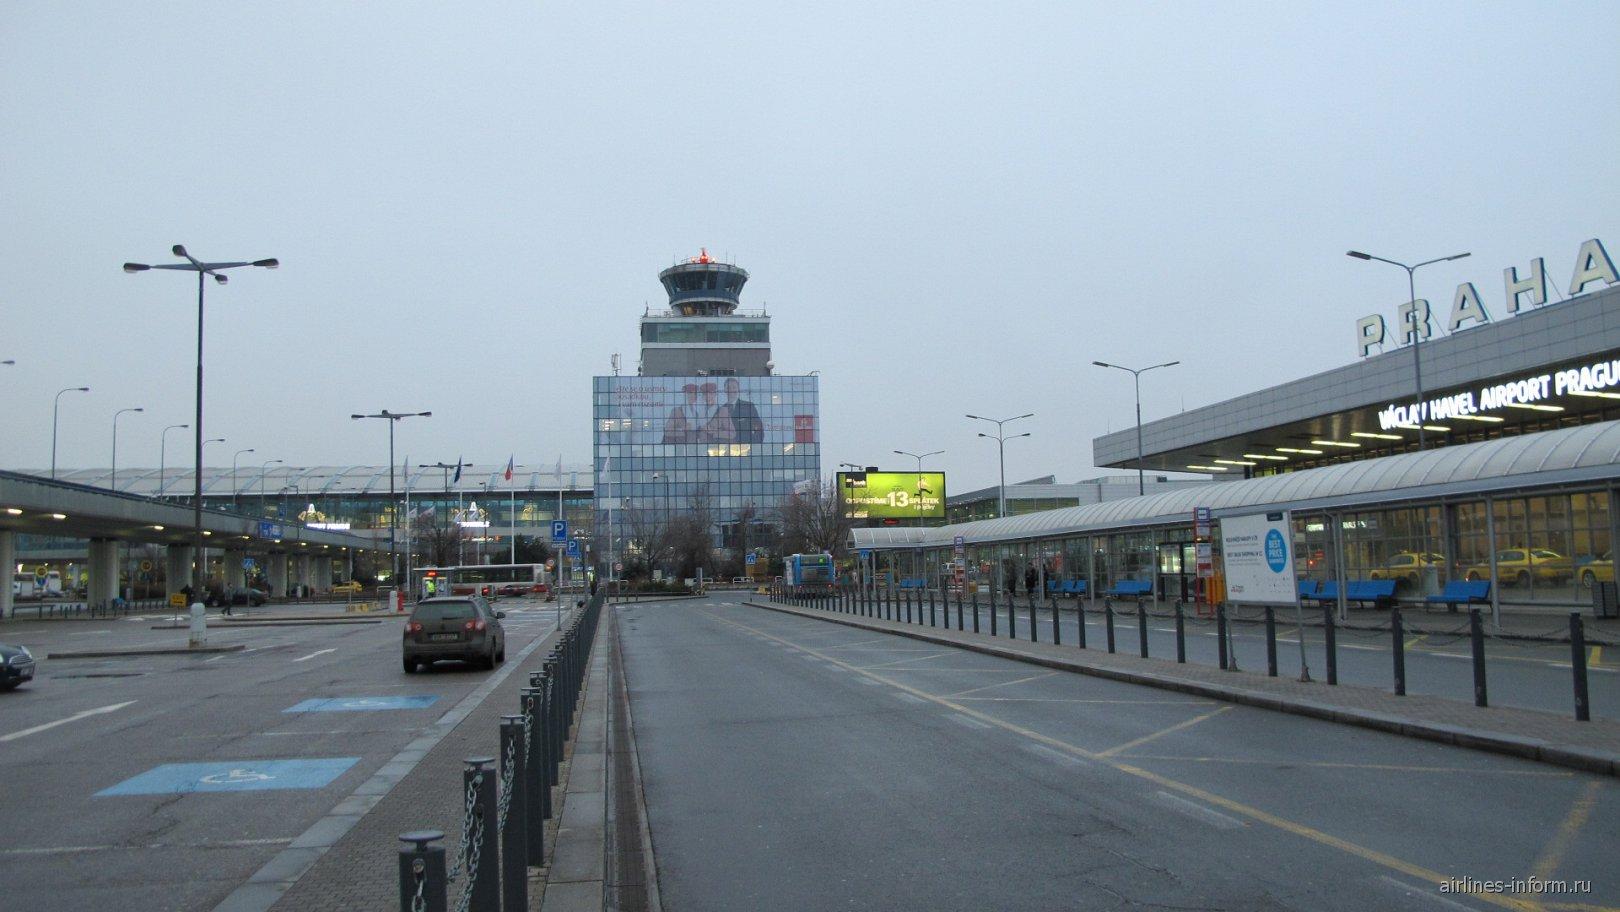 Аэропорт Праги имени Вацлава Гавела